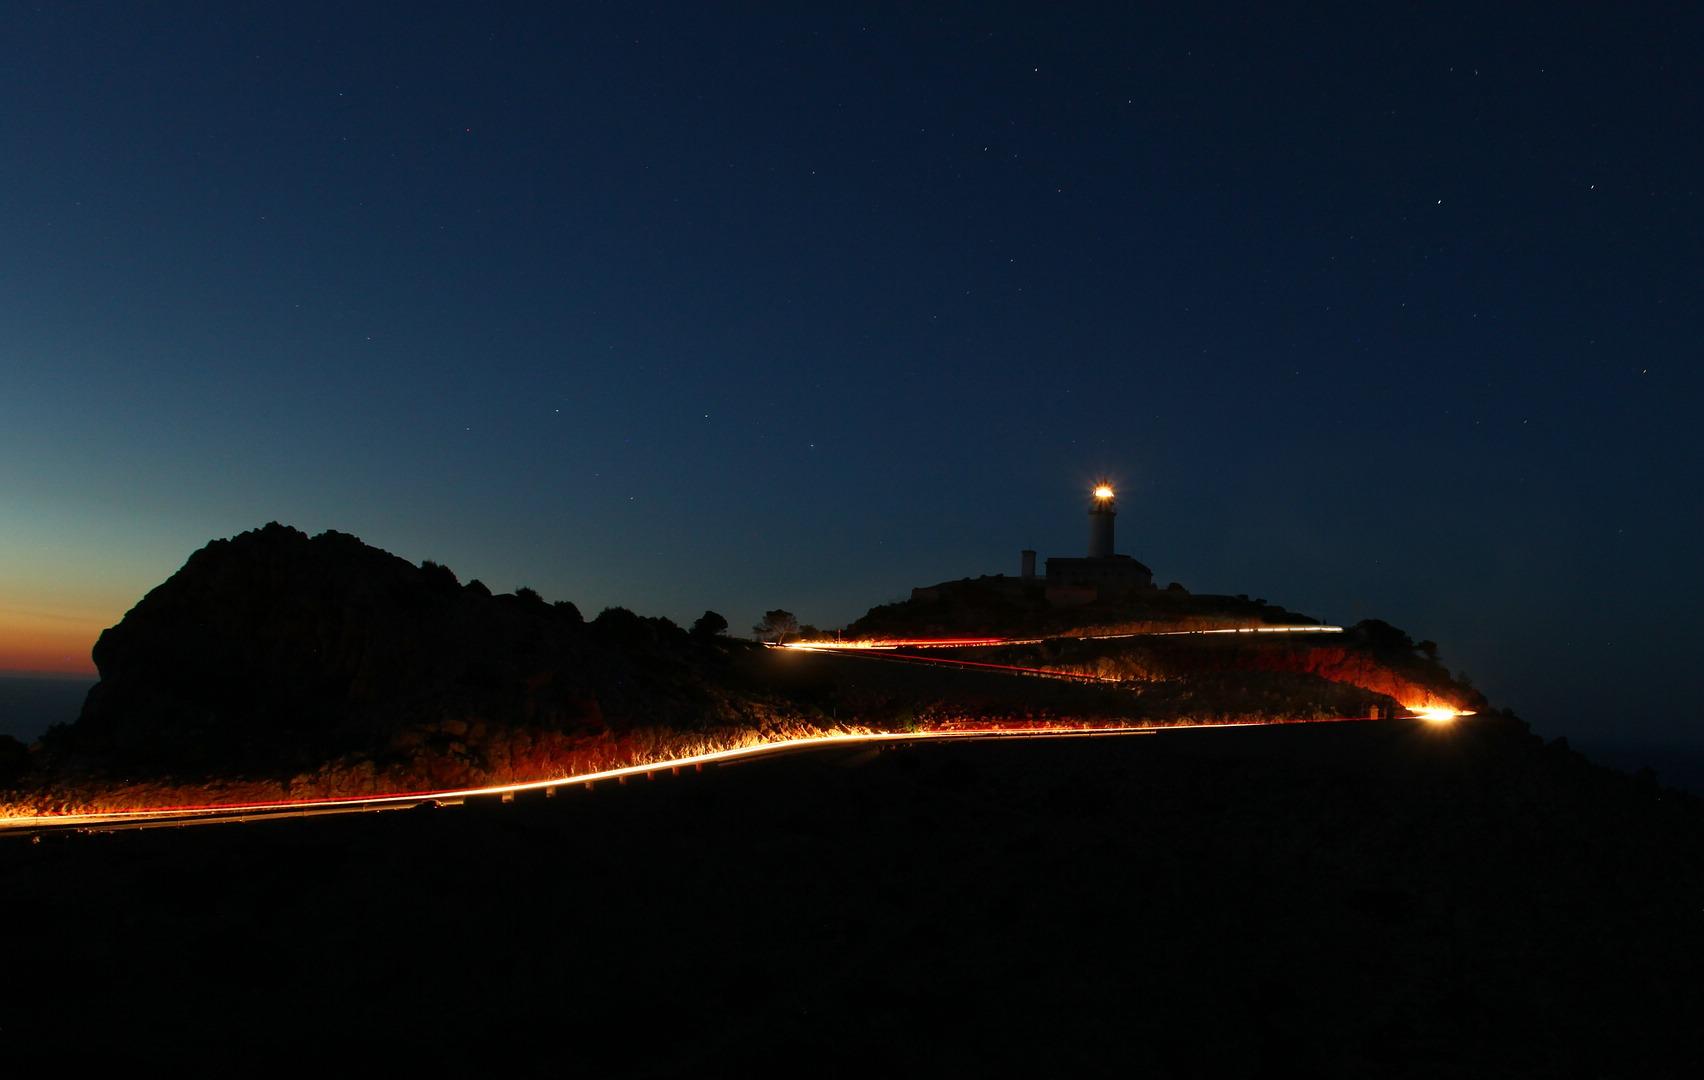 Mallorca_Leuchtturm-Spur2-H-HP 1920x1080